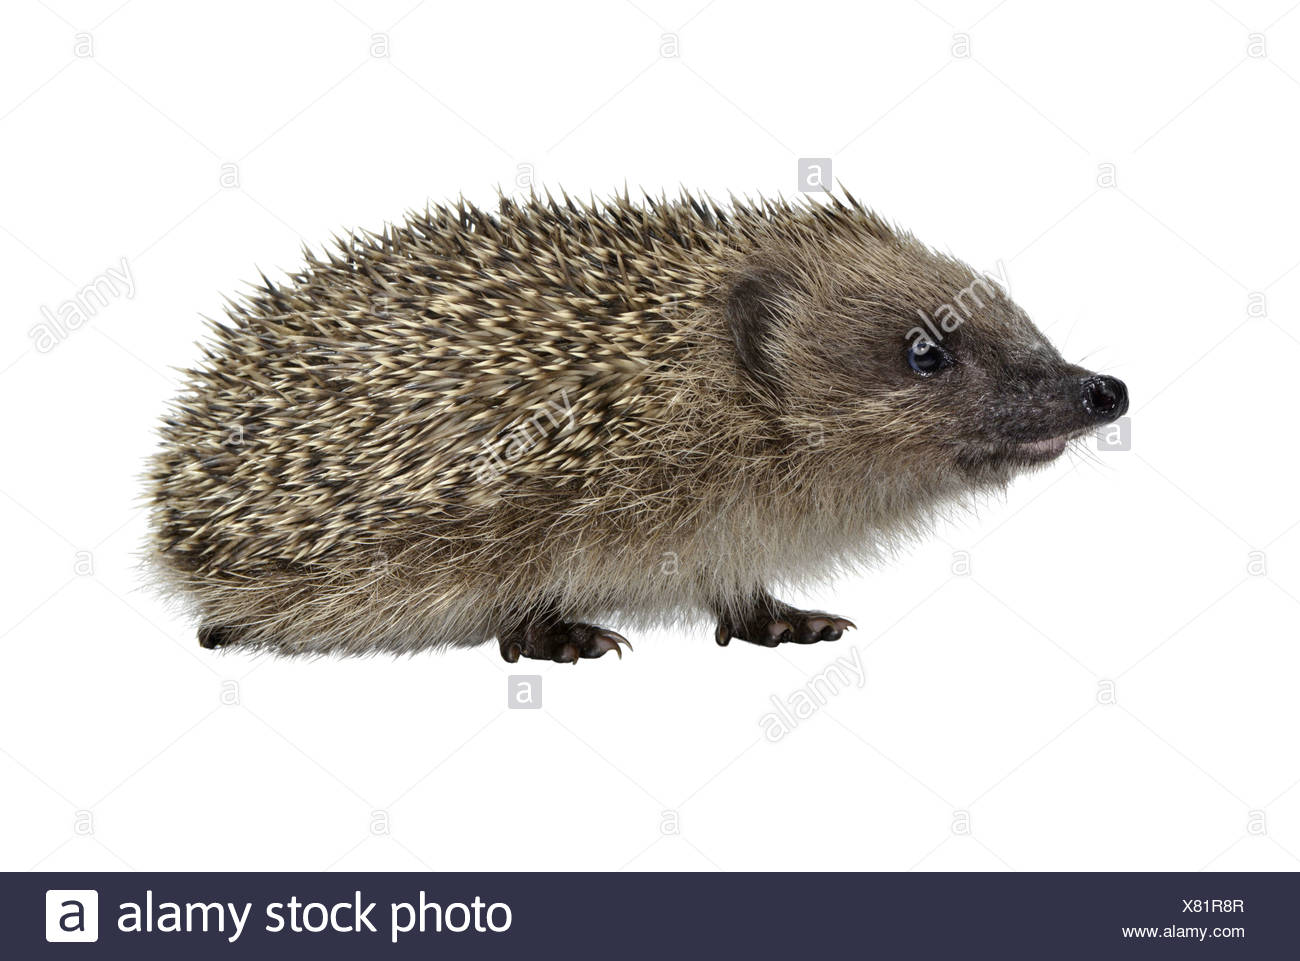 Hedgehog Erinaceus europaeus - Stock Image